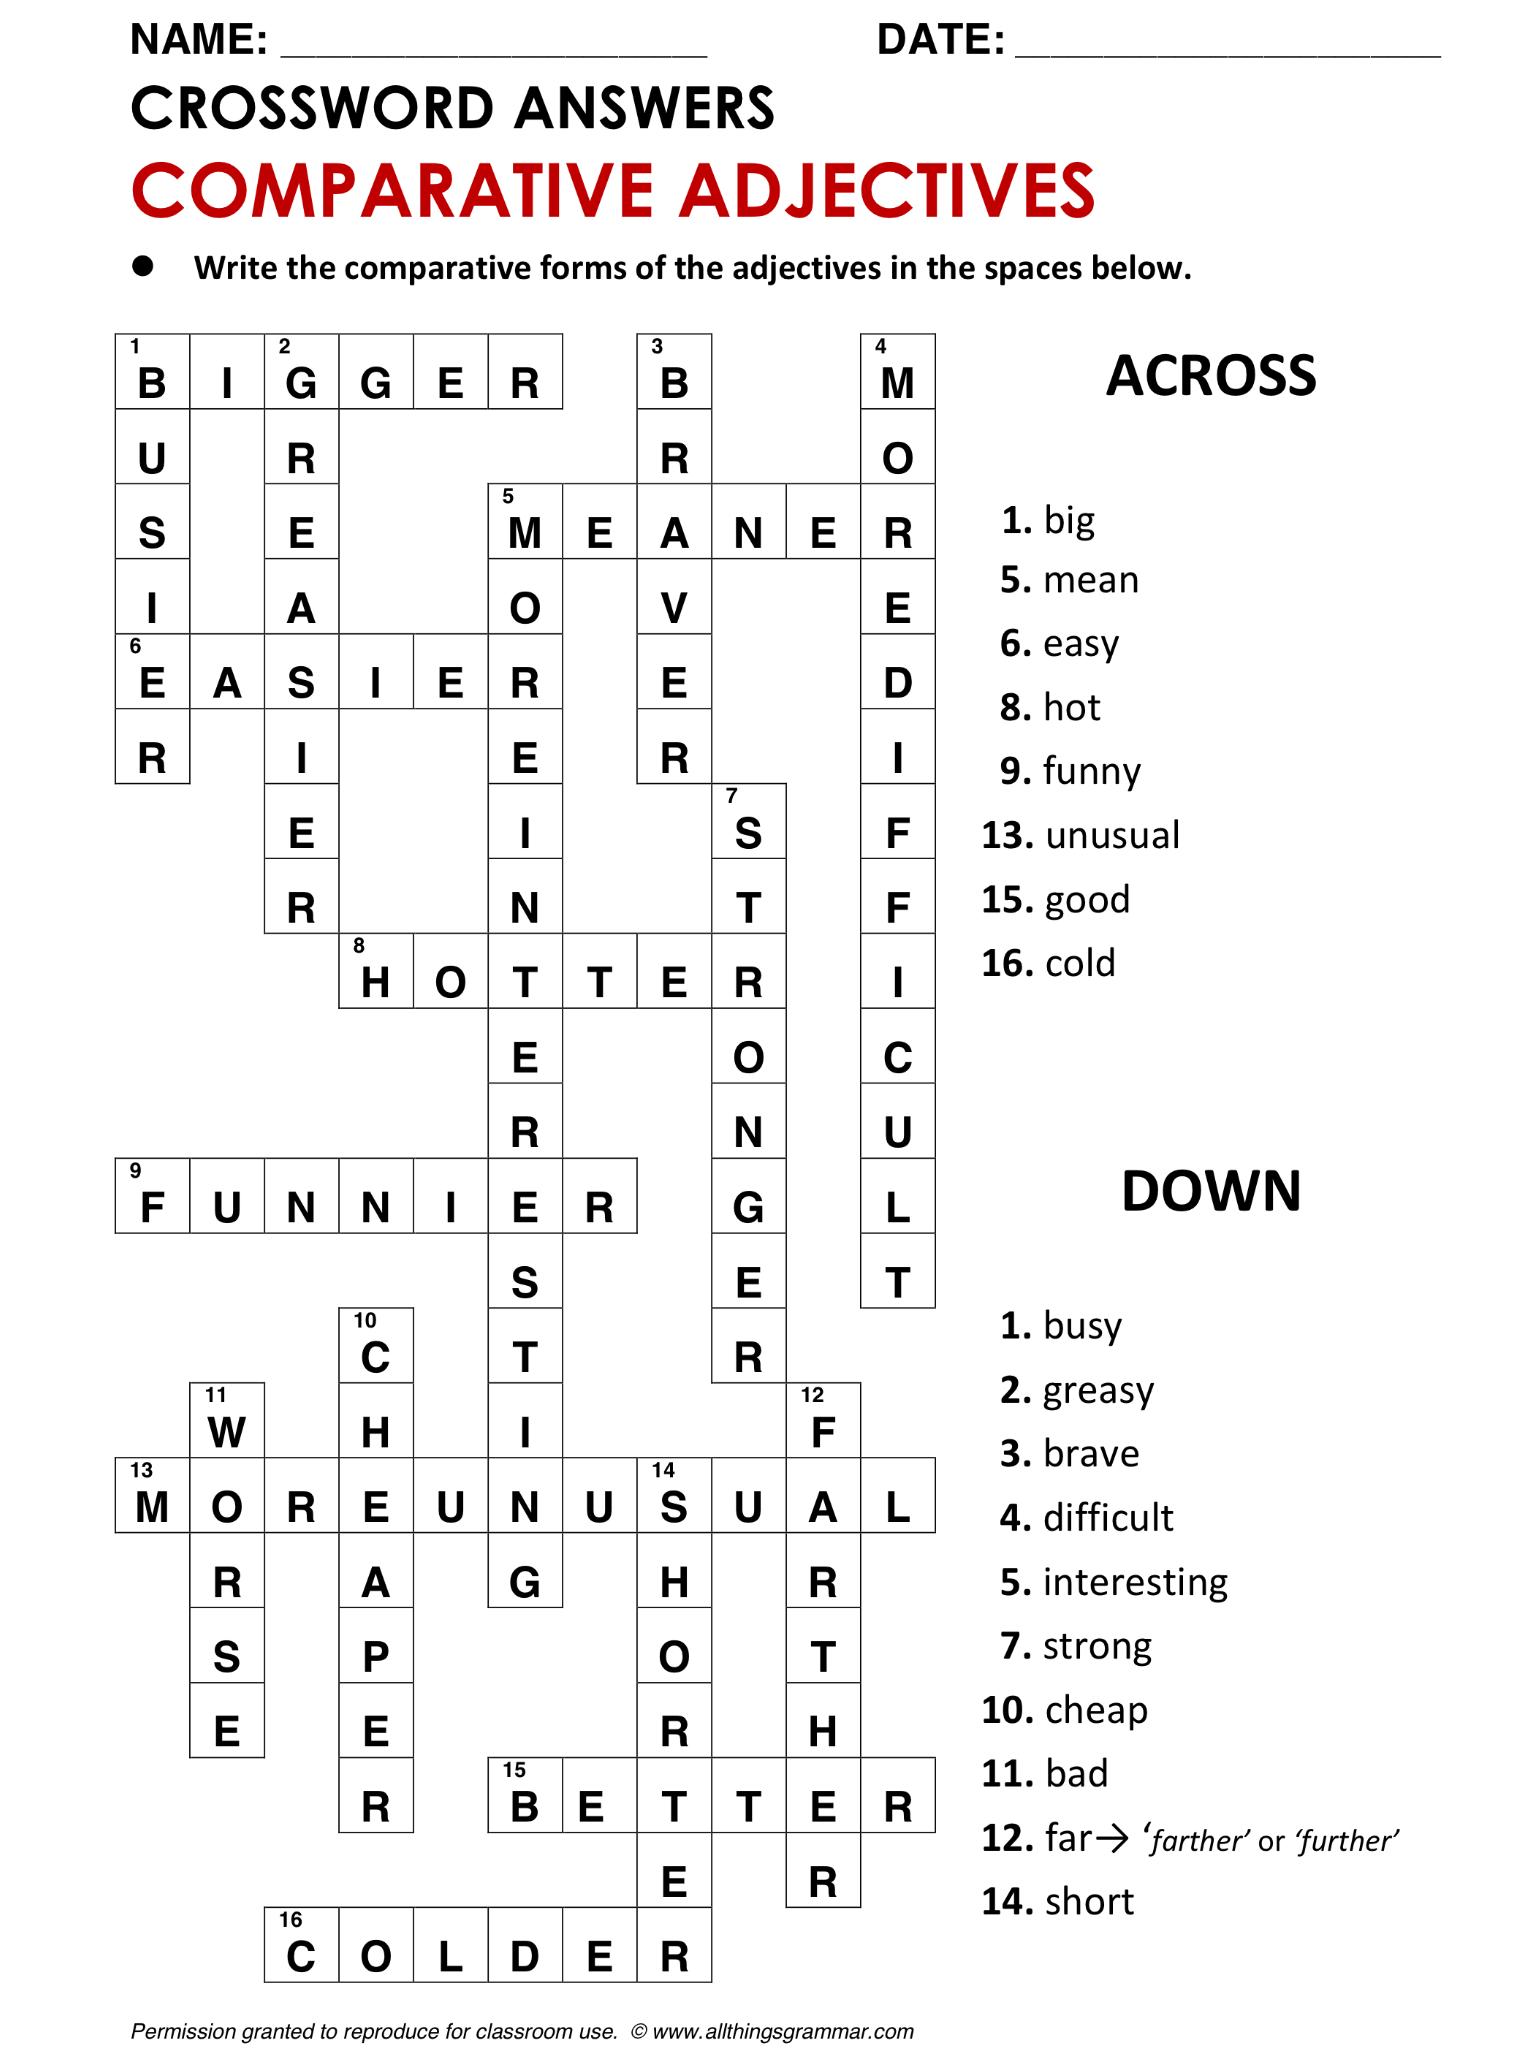 English Grammar Crossword Comparative Adjectives